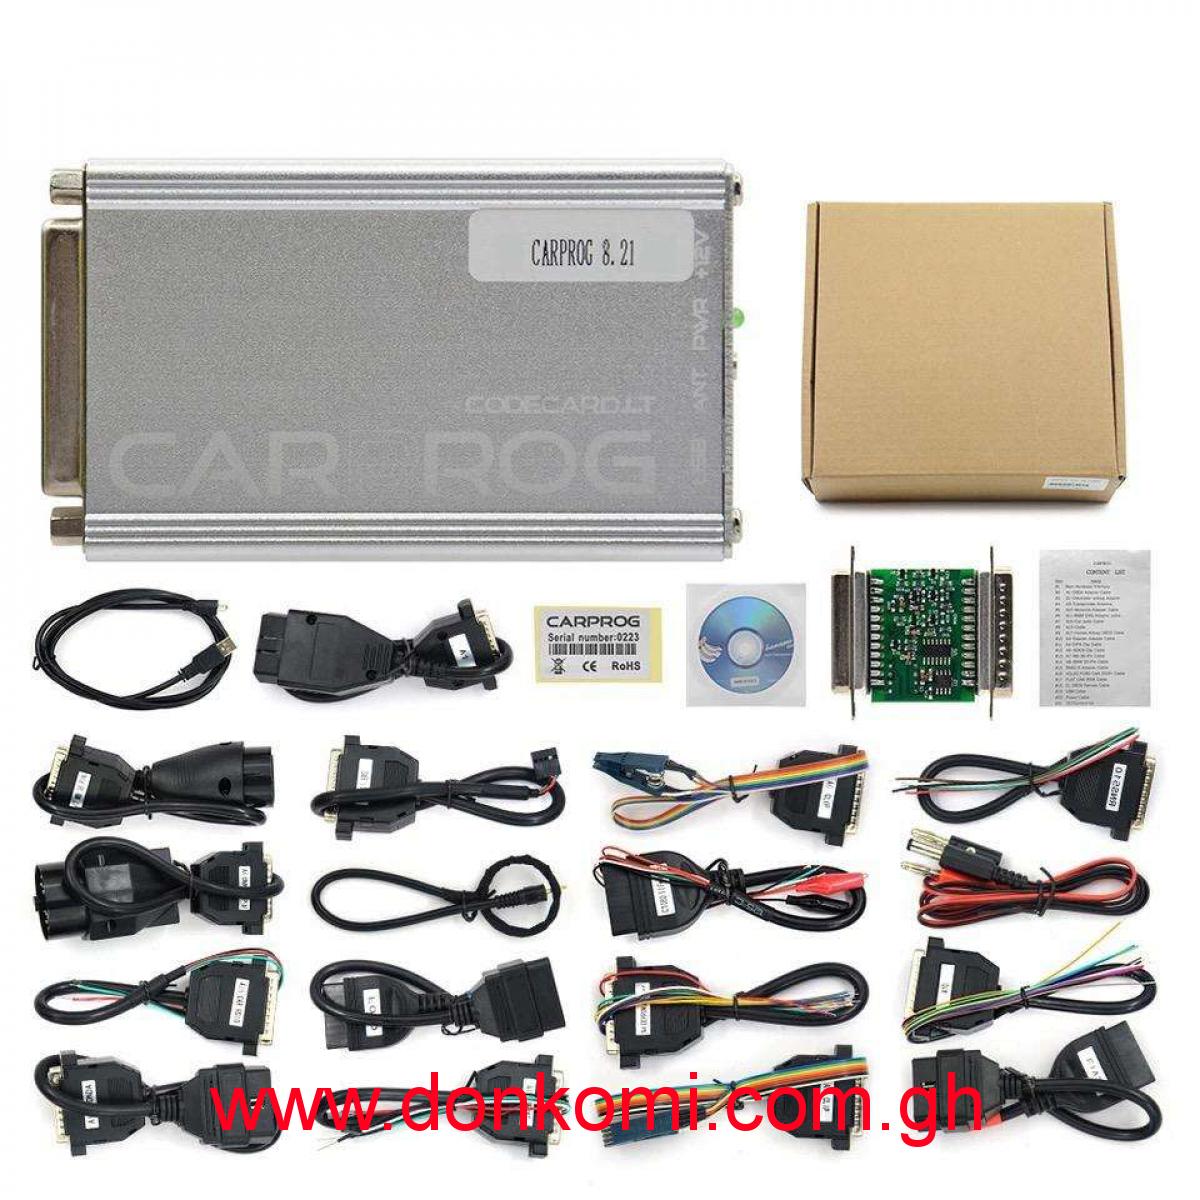 Carprog Full decoder for Airbag/Radio/Immobilizer/ECU programming